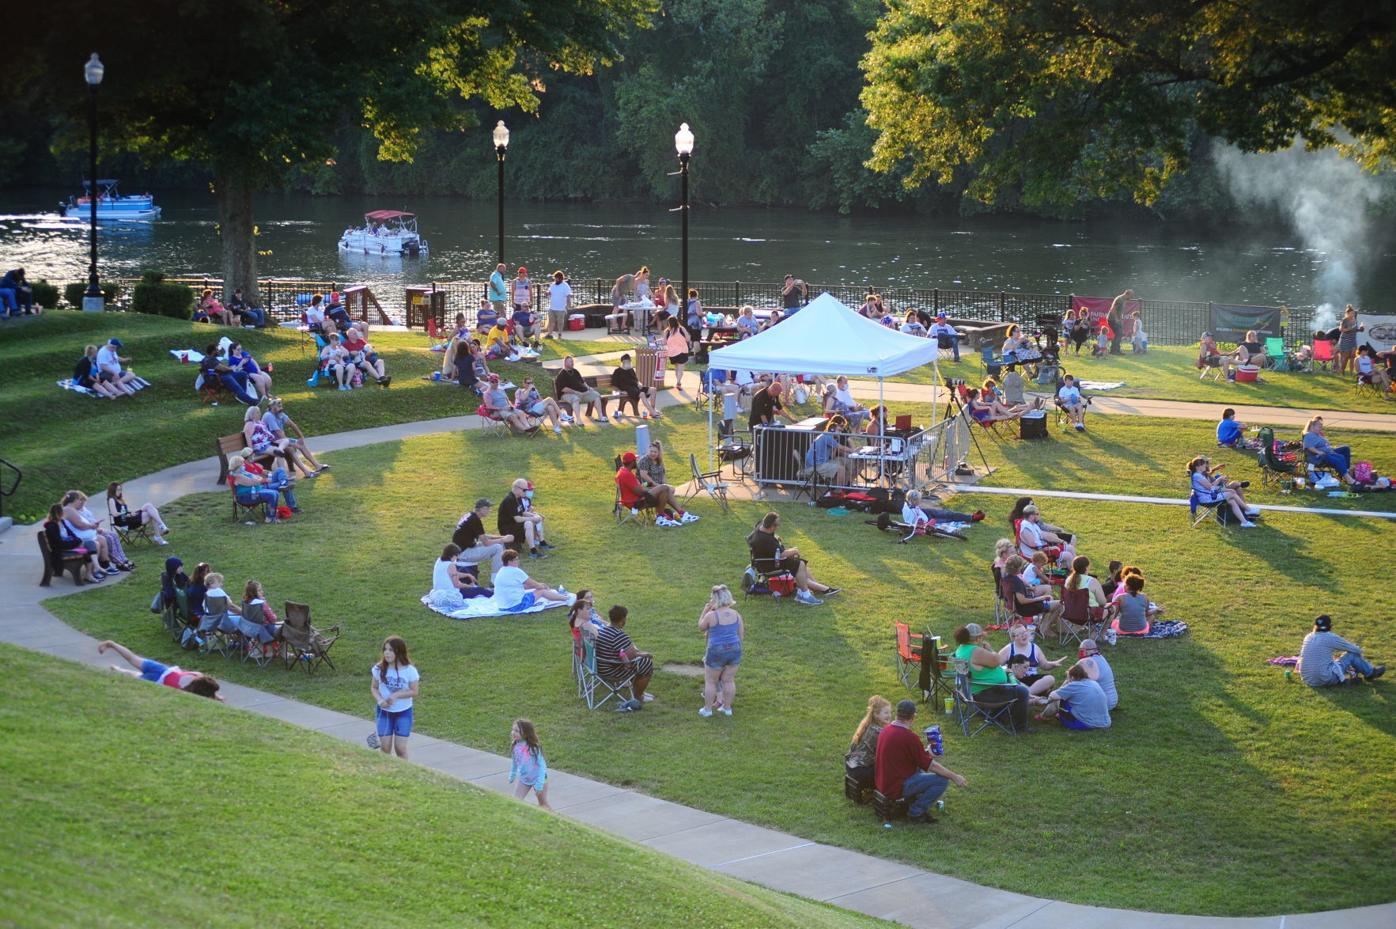 Palatine Park Fourth of July 2020